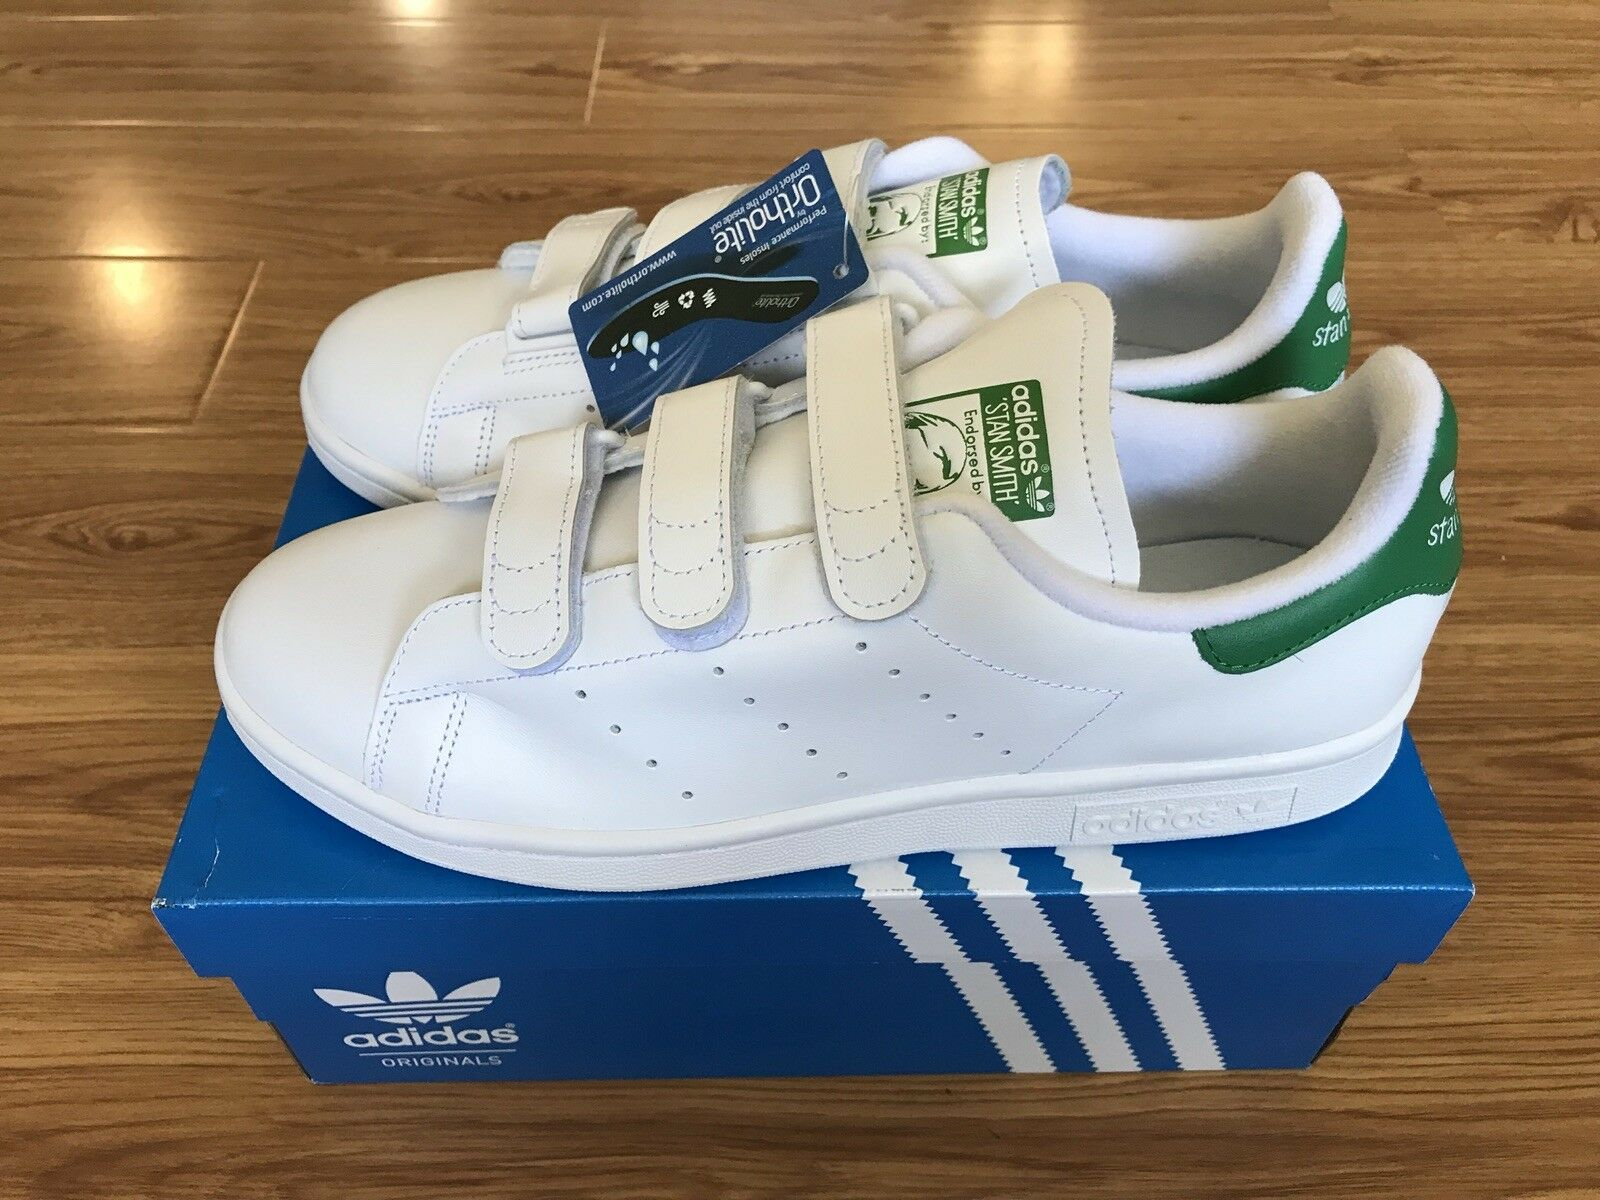 meet 8e67b 18776 Brand New Adidas Originals Stan Smith CF CF CF White Green S75187 Size US  9.5